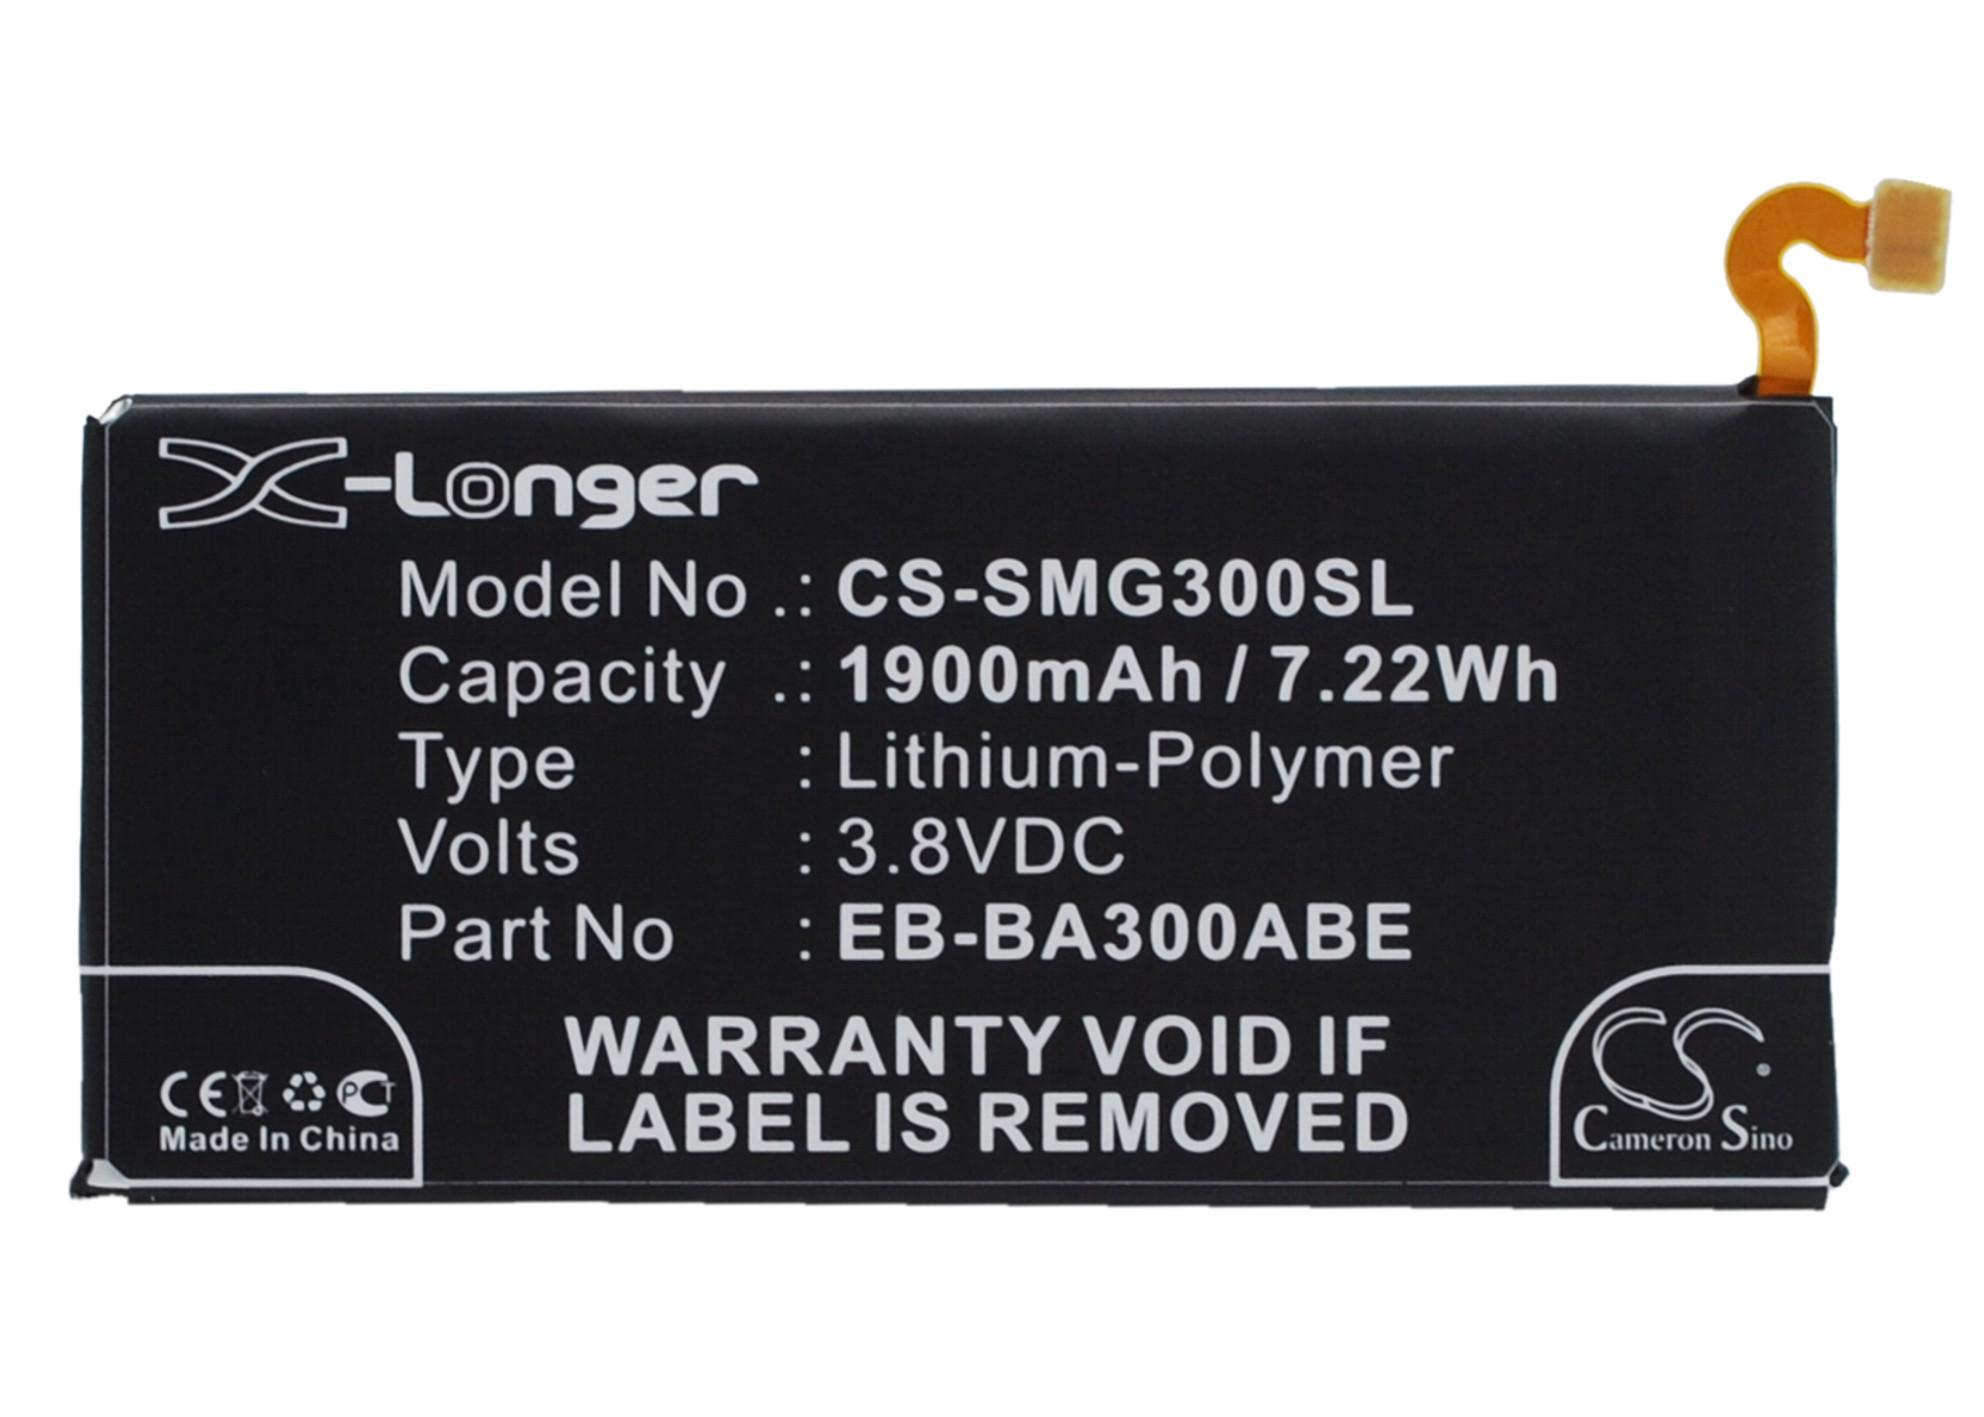 Cameron Sino baterie do mobilů pro SAMSUNG SM-A300F/DS 3.8V Li-Polymer 1900mAh černá - neoriginální